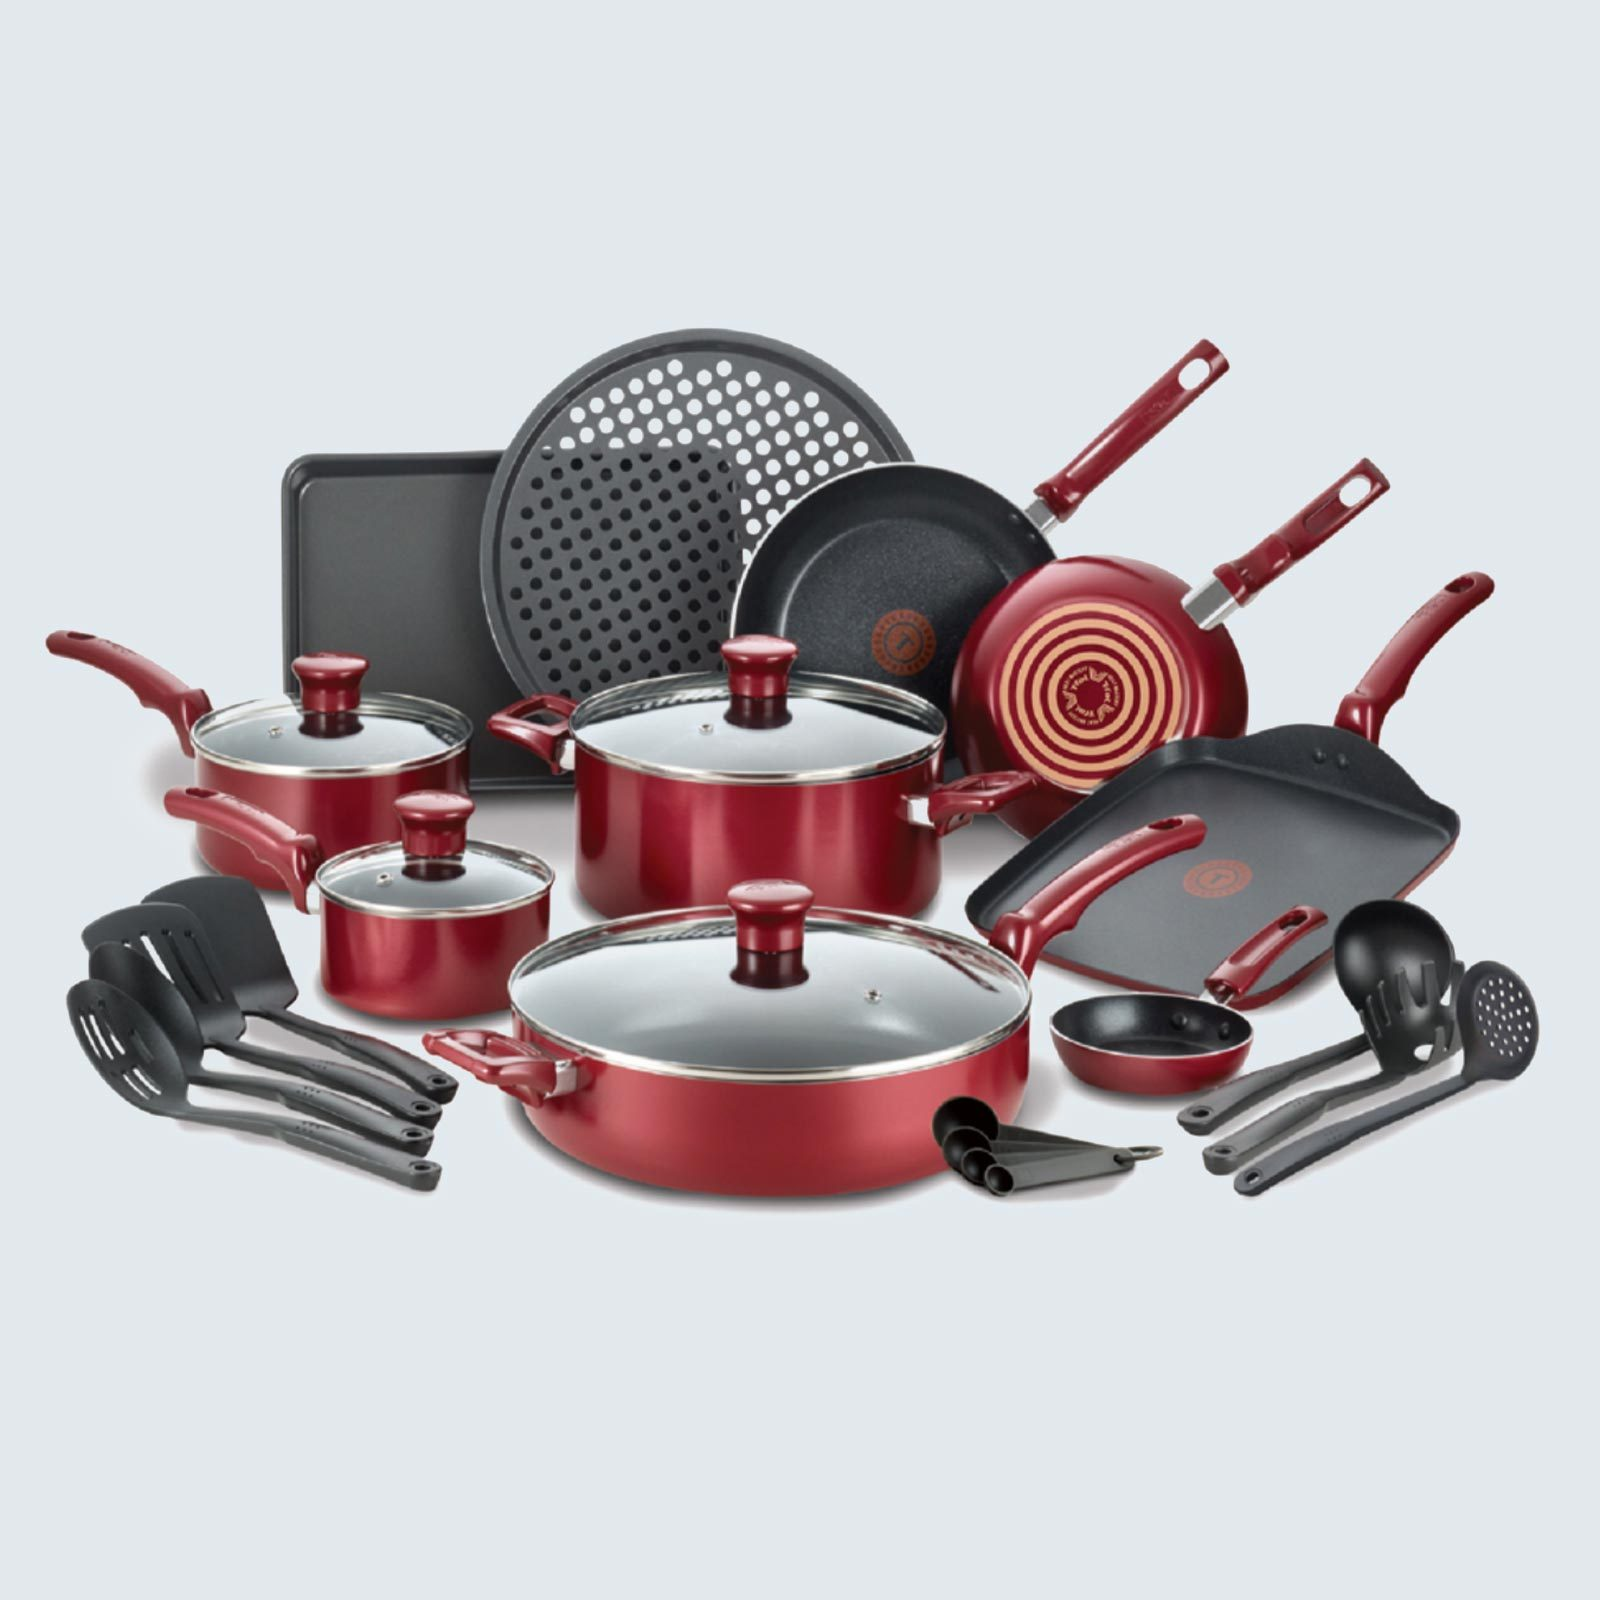 T-fal Kitchen Solutions 22-Piece Nonstick Cookware Set